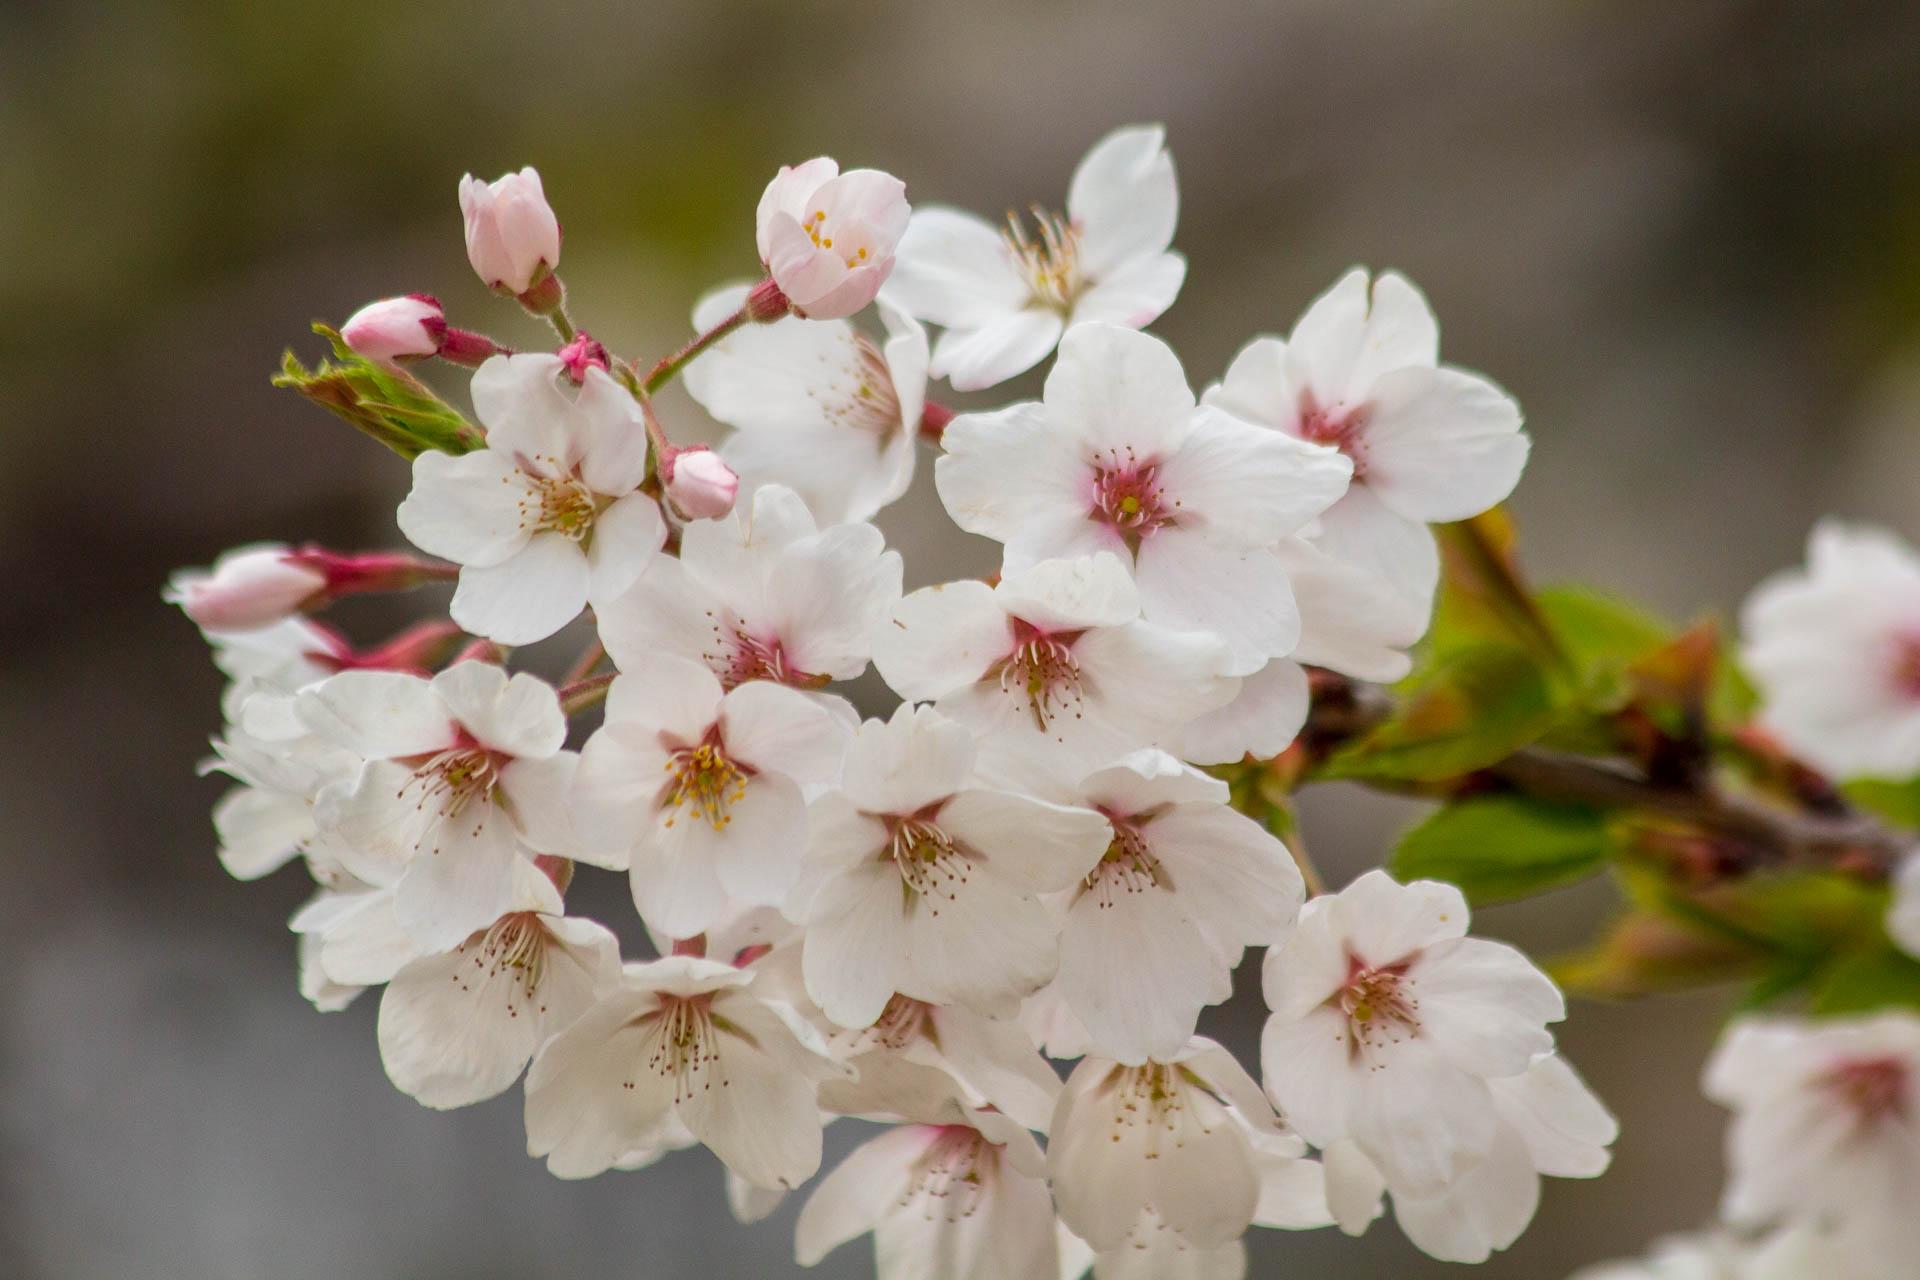 Sakura-Watch-May-10-2018-136.jpg